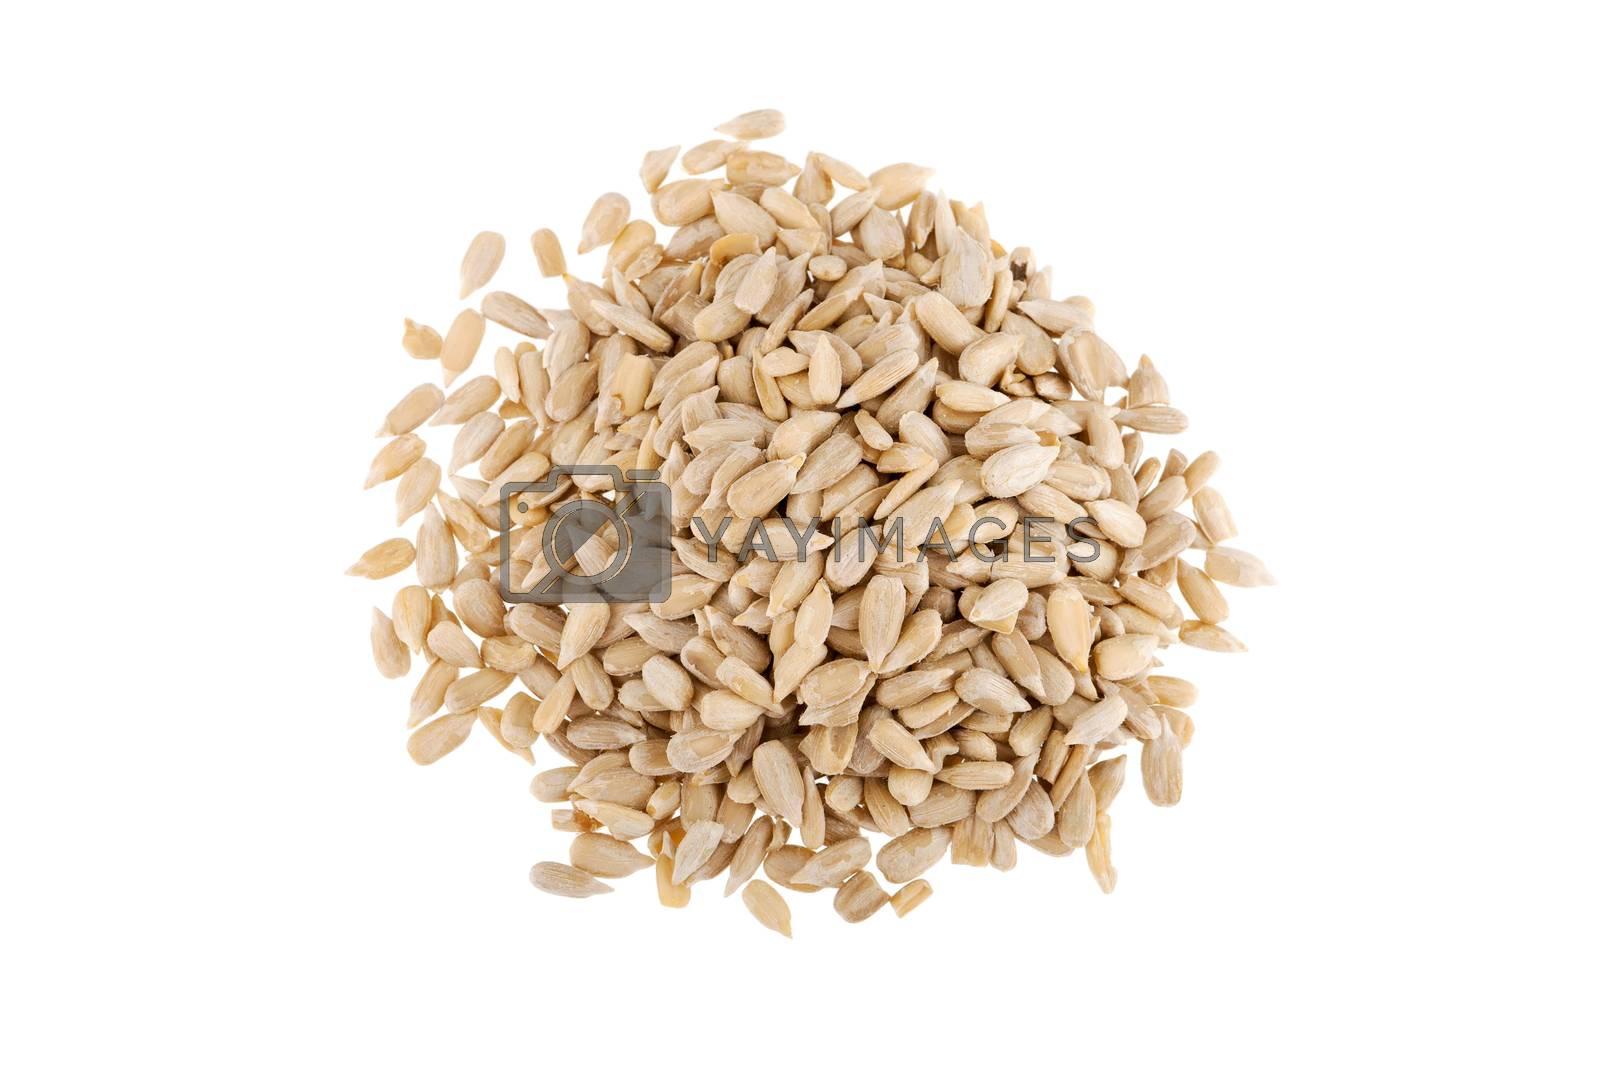 Sunflower seeds - isolated on white background